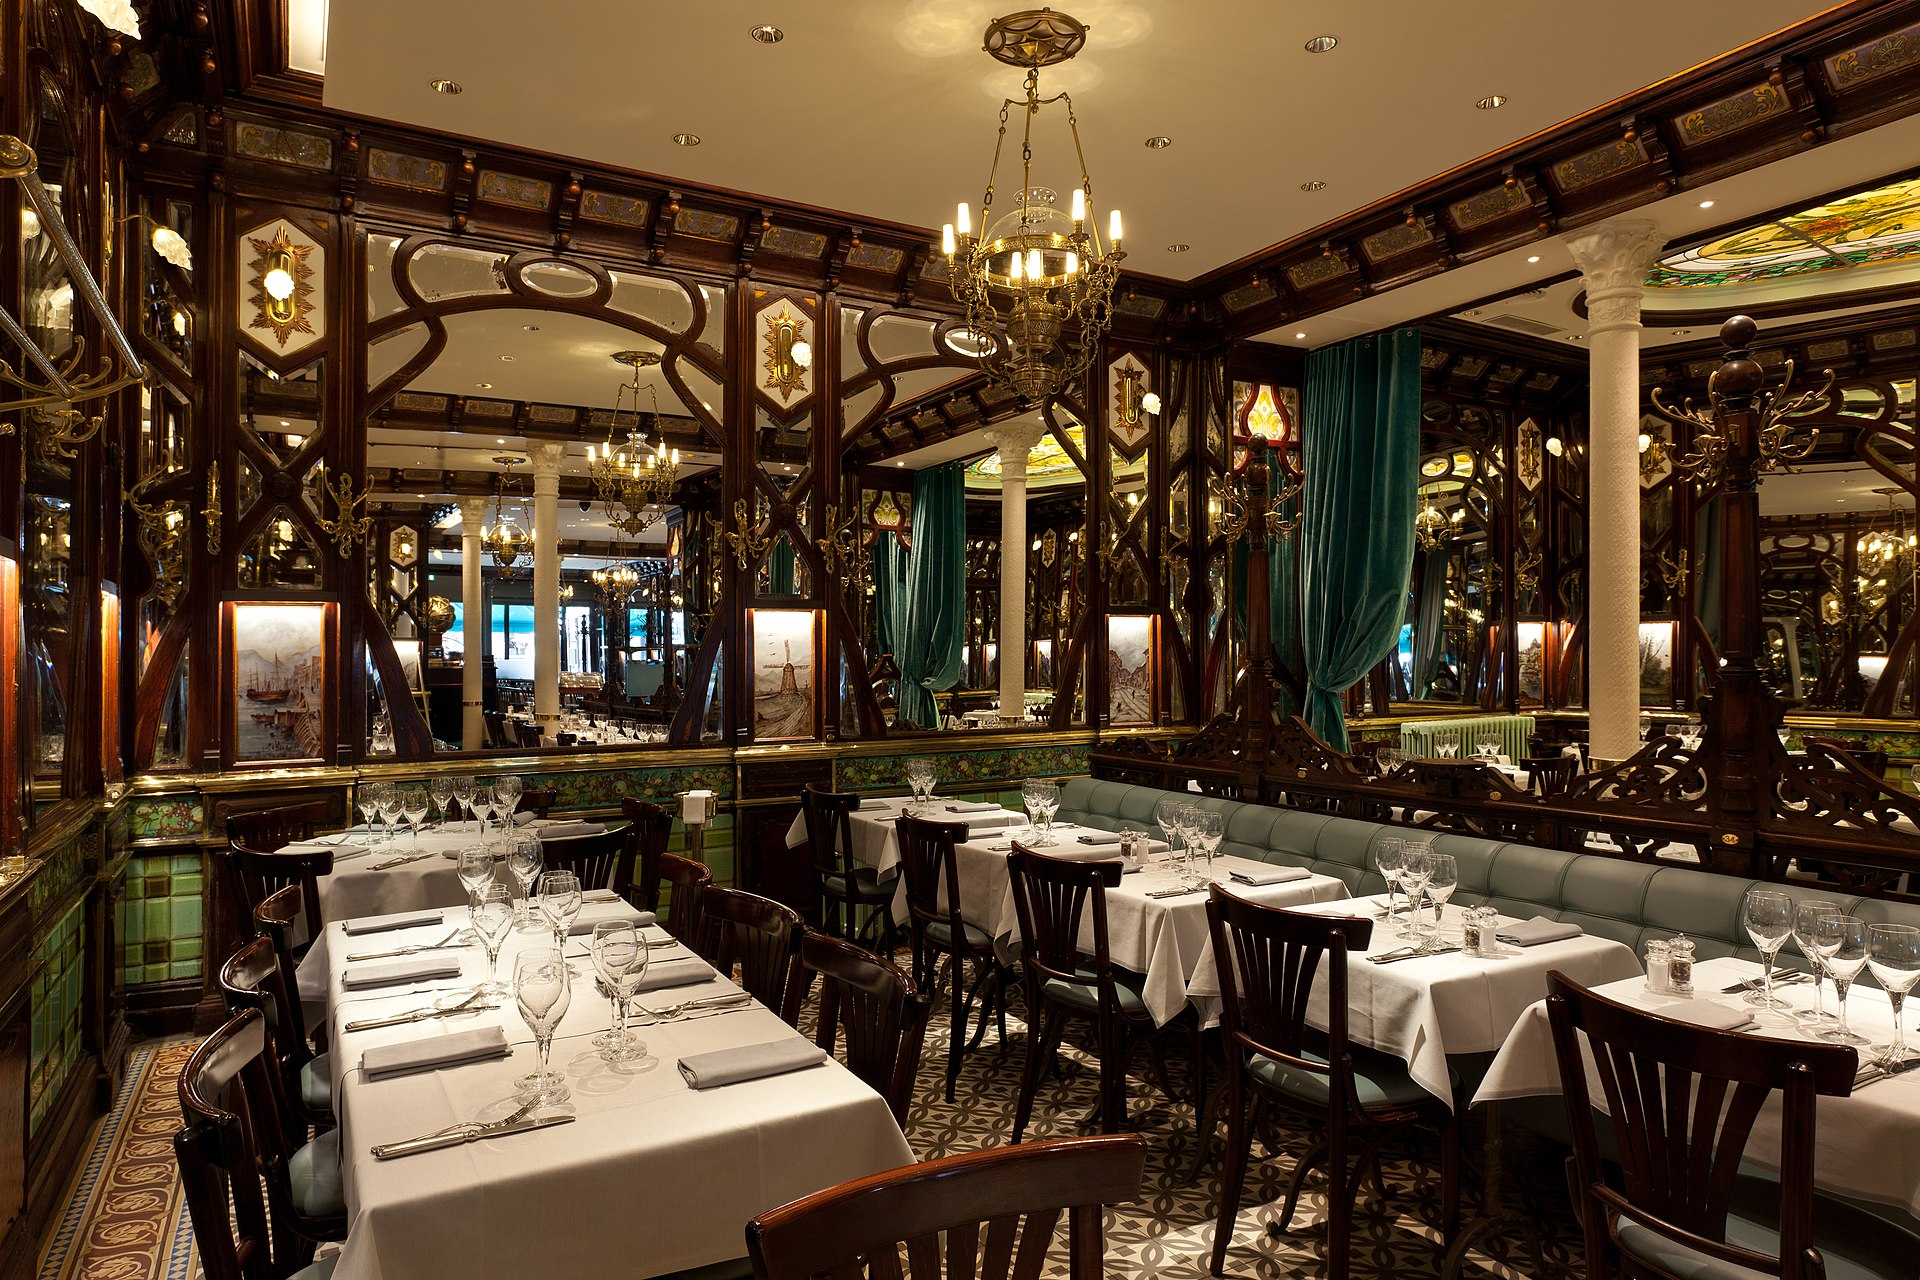 Restaurant Chez Vagenende